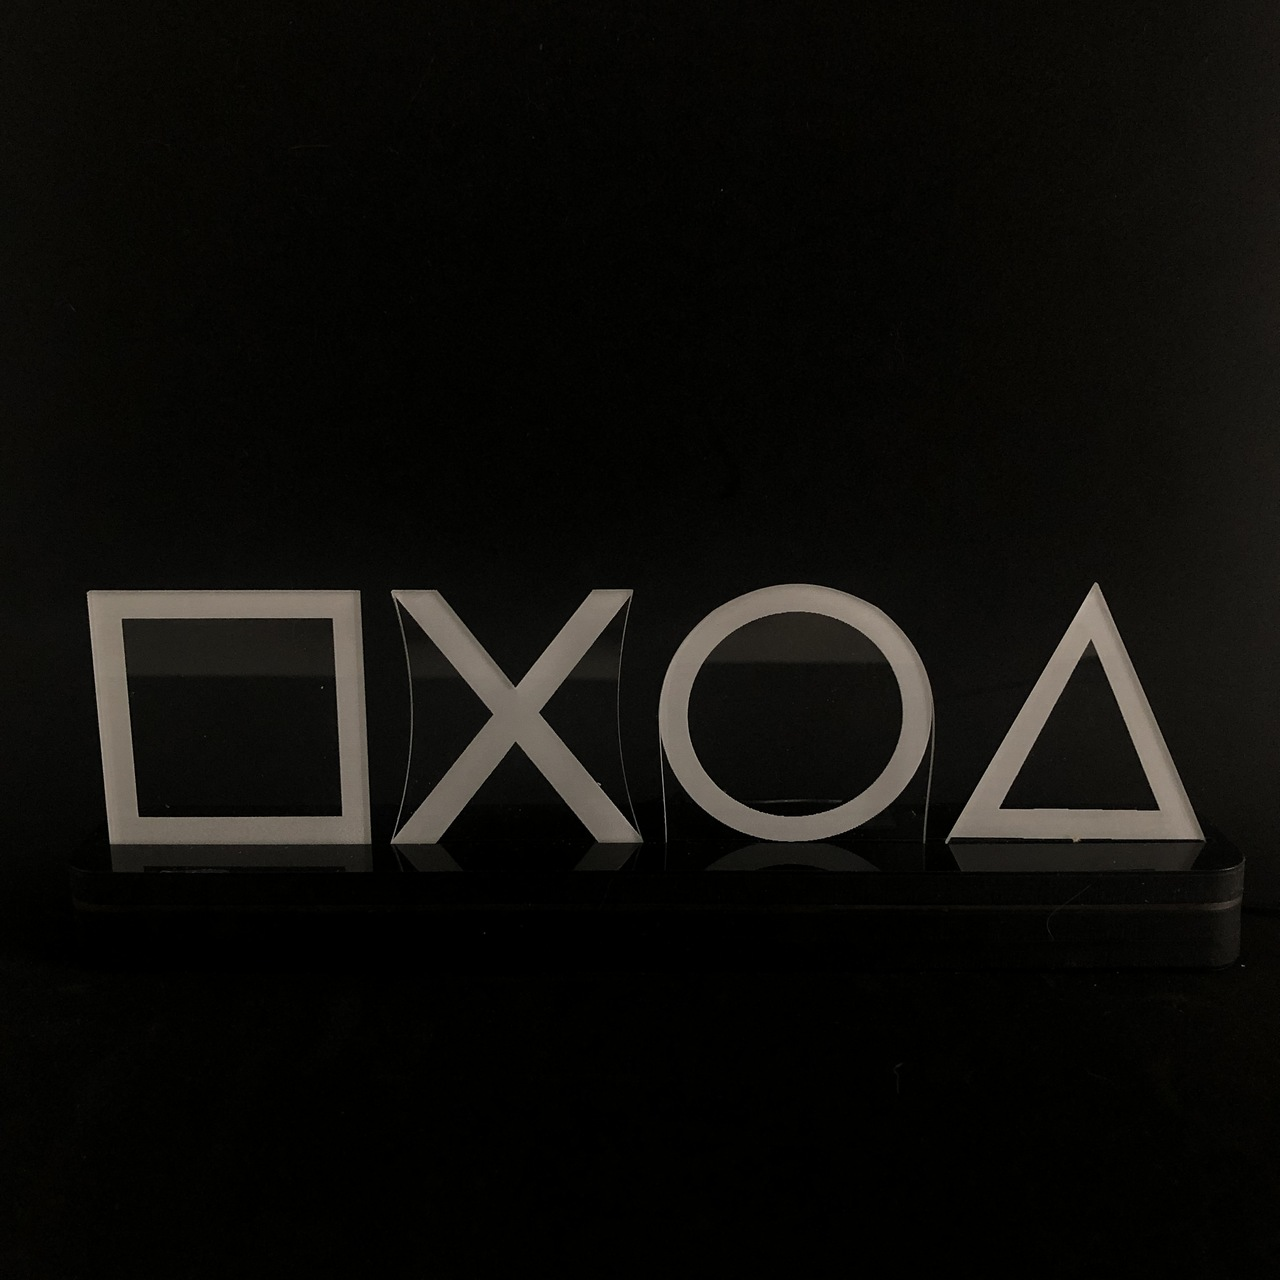 Luminária Símbolos Playstation